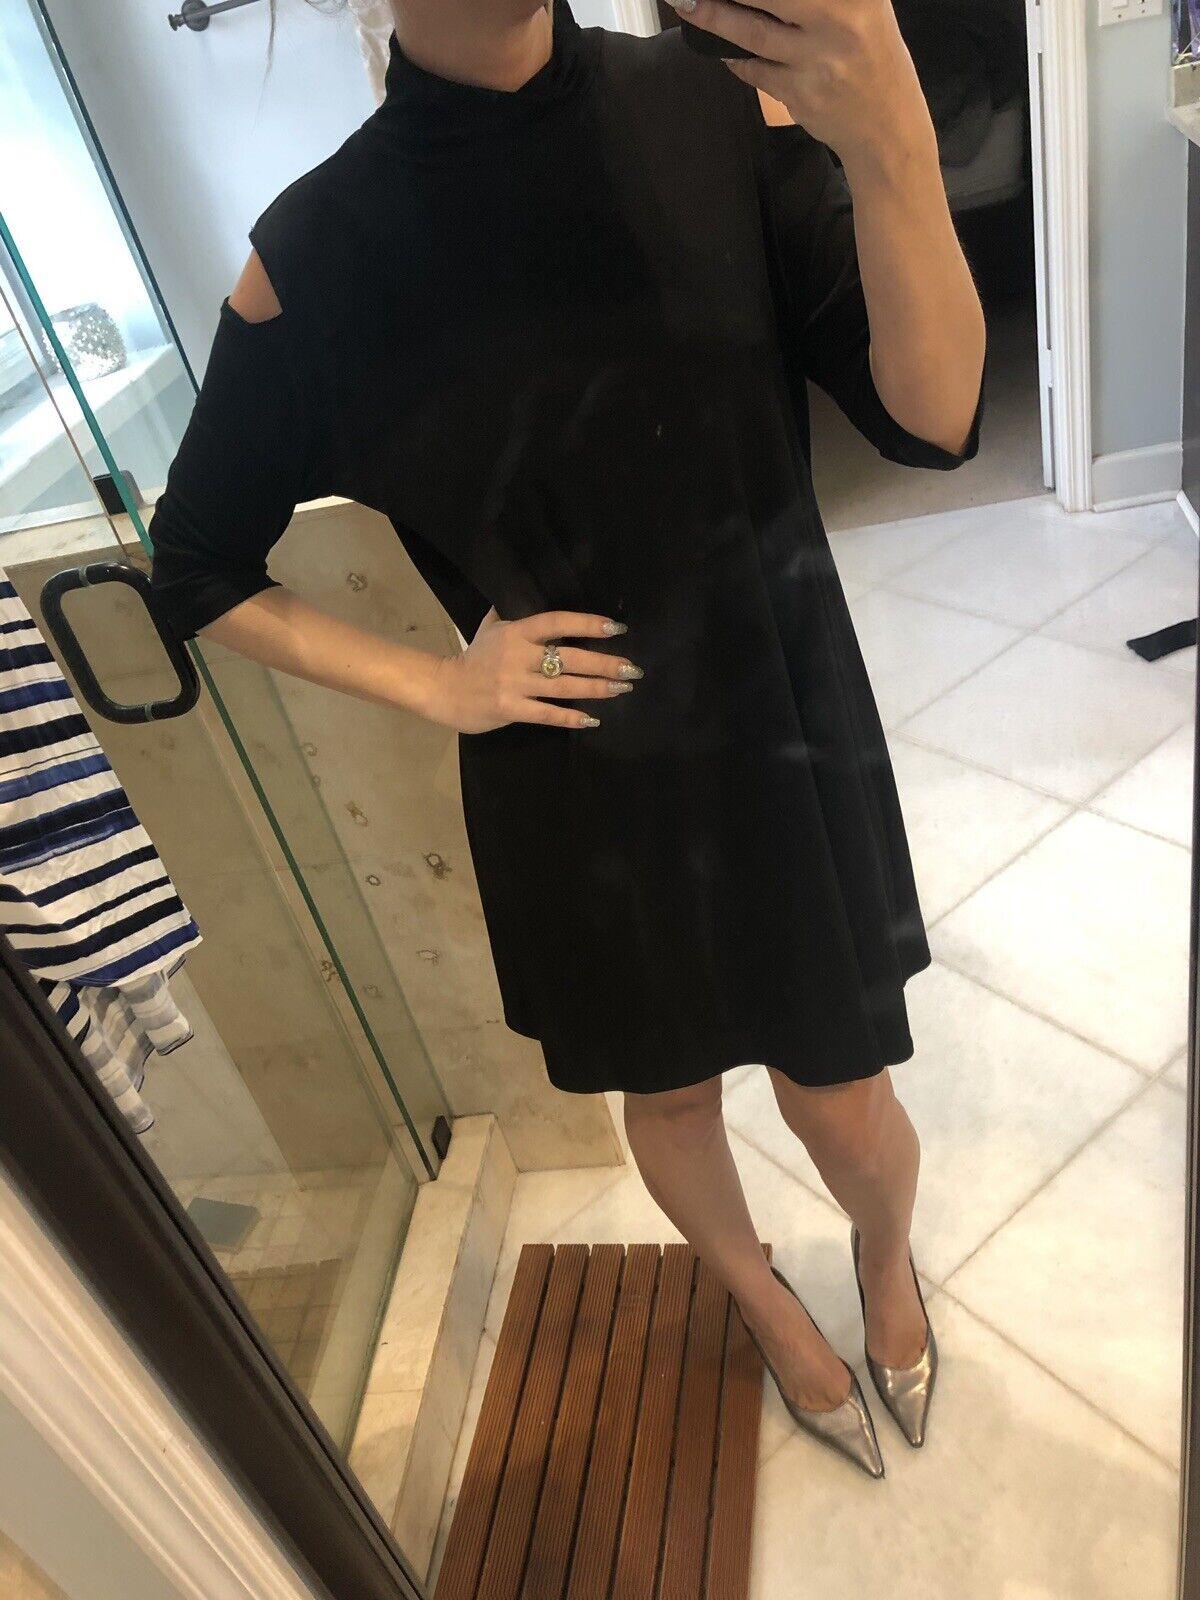 Euc Clara Sun Woo Mock Neck cold shoulder Knit Tunic M Medium  schwarz Dress